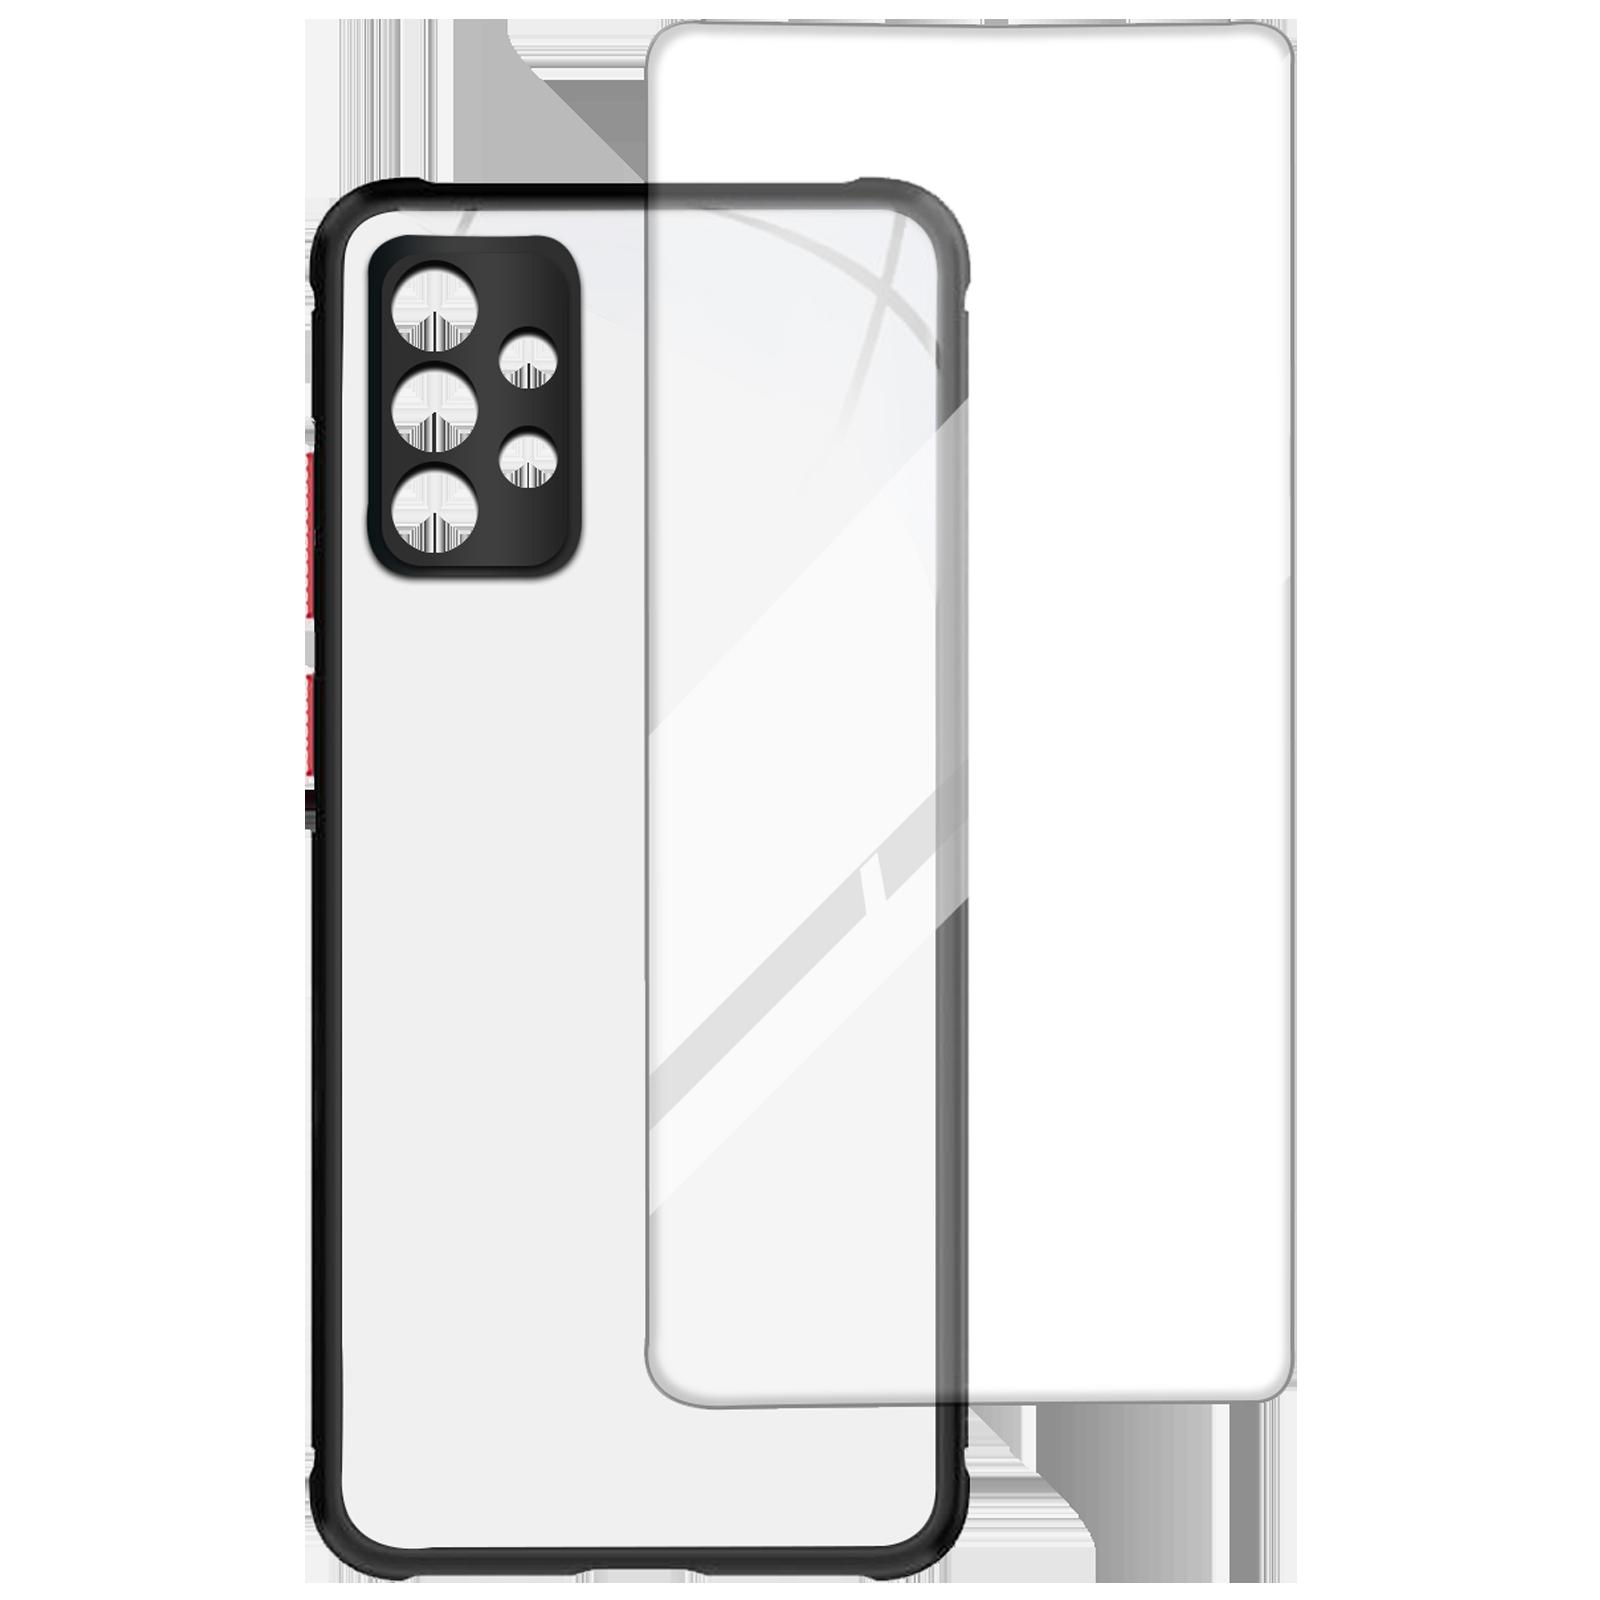 Arrow Hybrid Back Case and Screen Protector Bundle For Samsung Galaxy A72 (Oleophobic Coated, AR-968, Black)_1